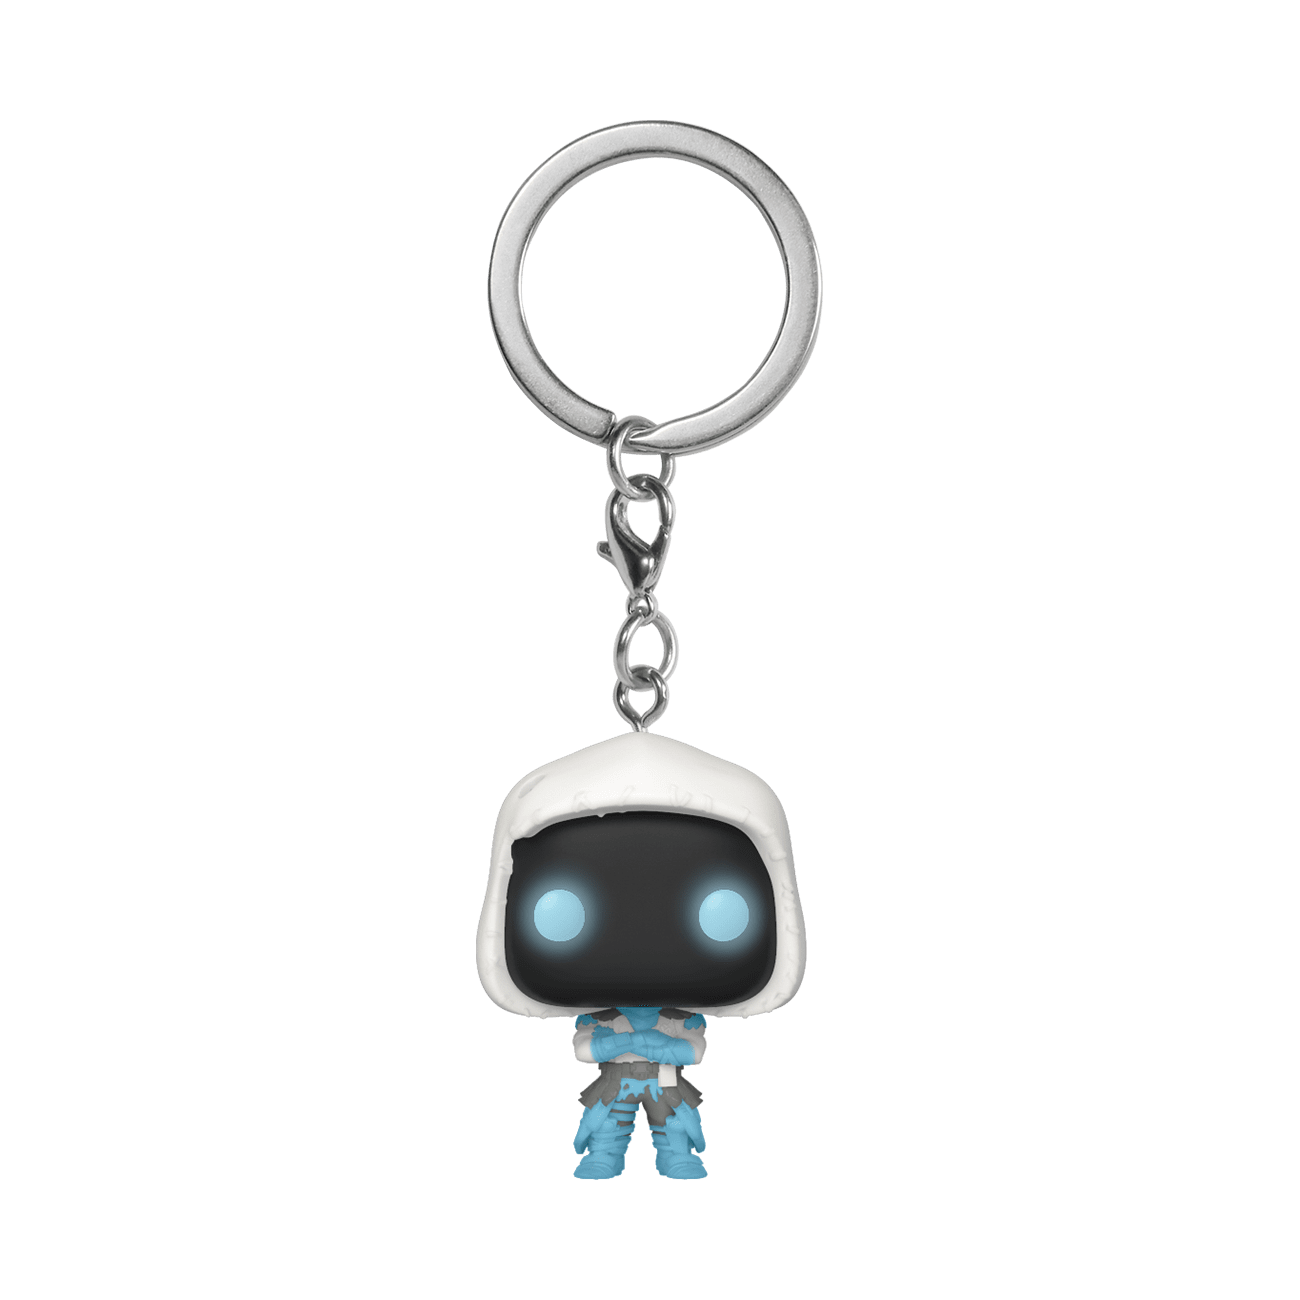 POP! Fortnite: Frozen Raven Keychain